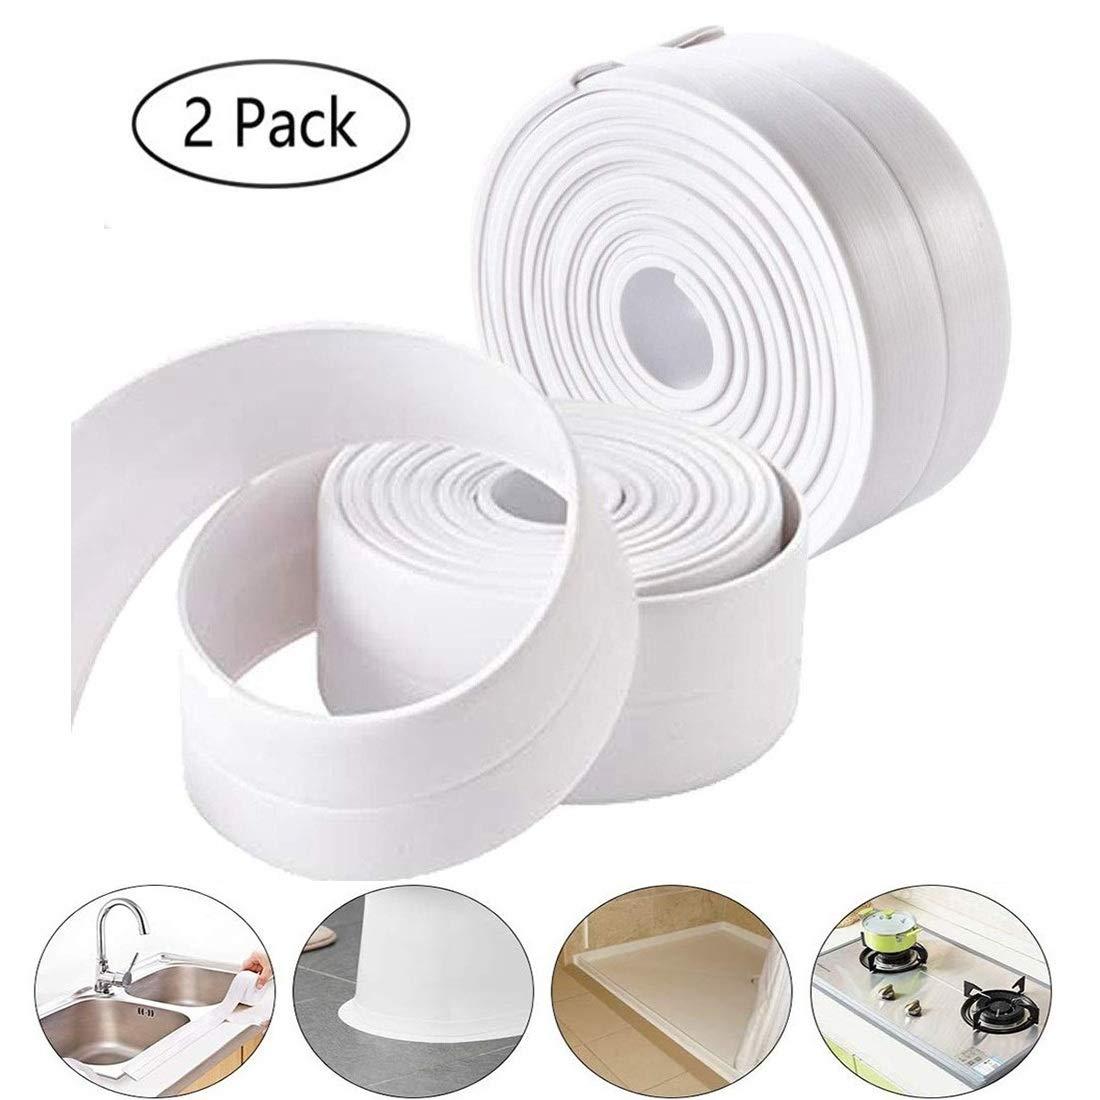 Caulk Strip, Ztent PE Self Adhesive Tape Sealing Tape Strip Waterproof Wall Sealant Caulking Roll for Bathtub Bathroom Shower Toilet Kitchen and Wall Sealing 11 Ft Length (38 mm 2 Pack, White)